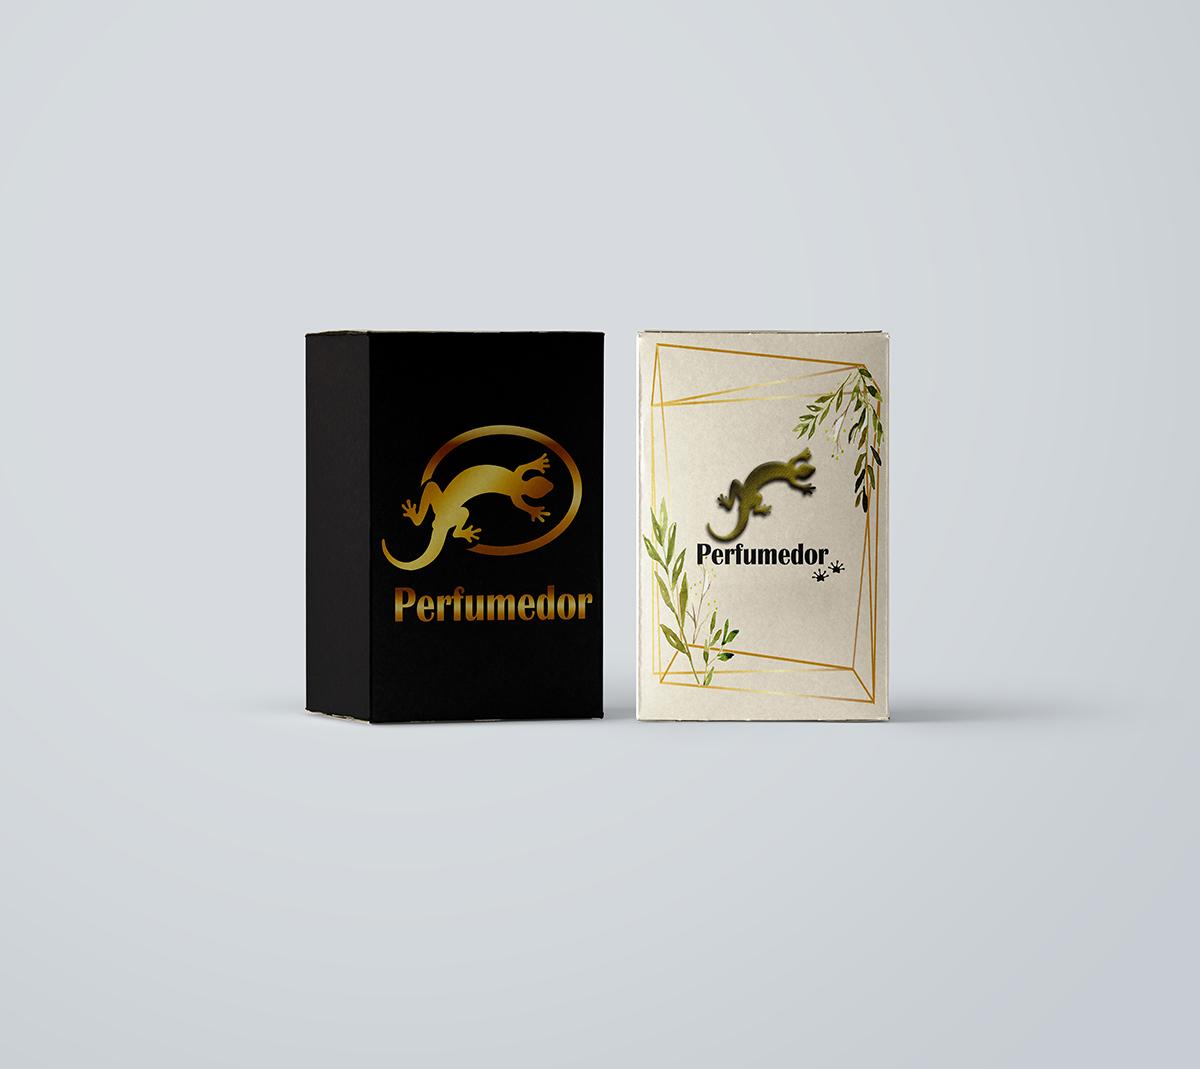 Логотип для интернет-магазина парфюмерии фото f_8215b4a374aac59c.jpg